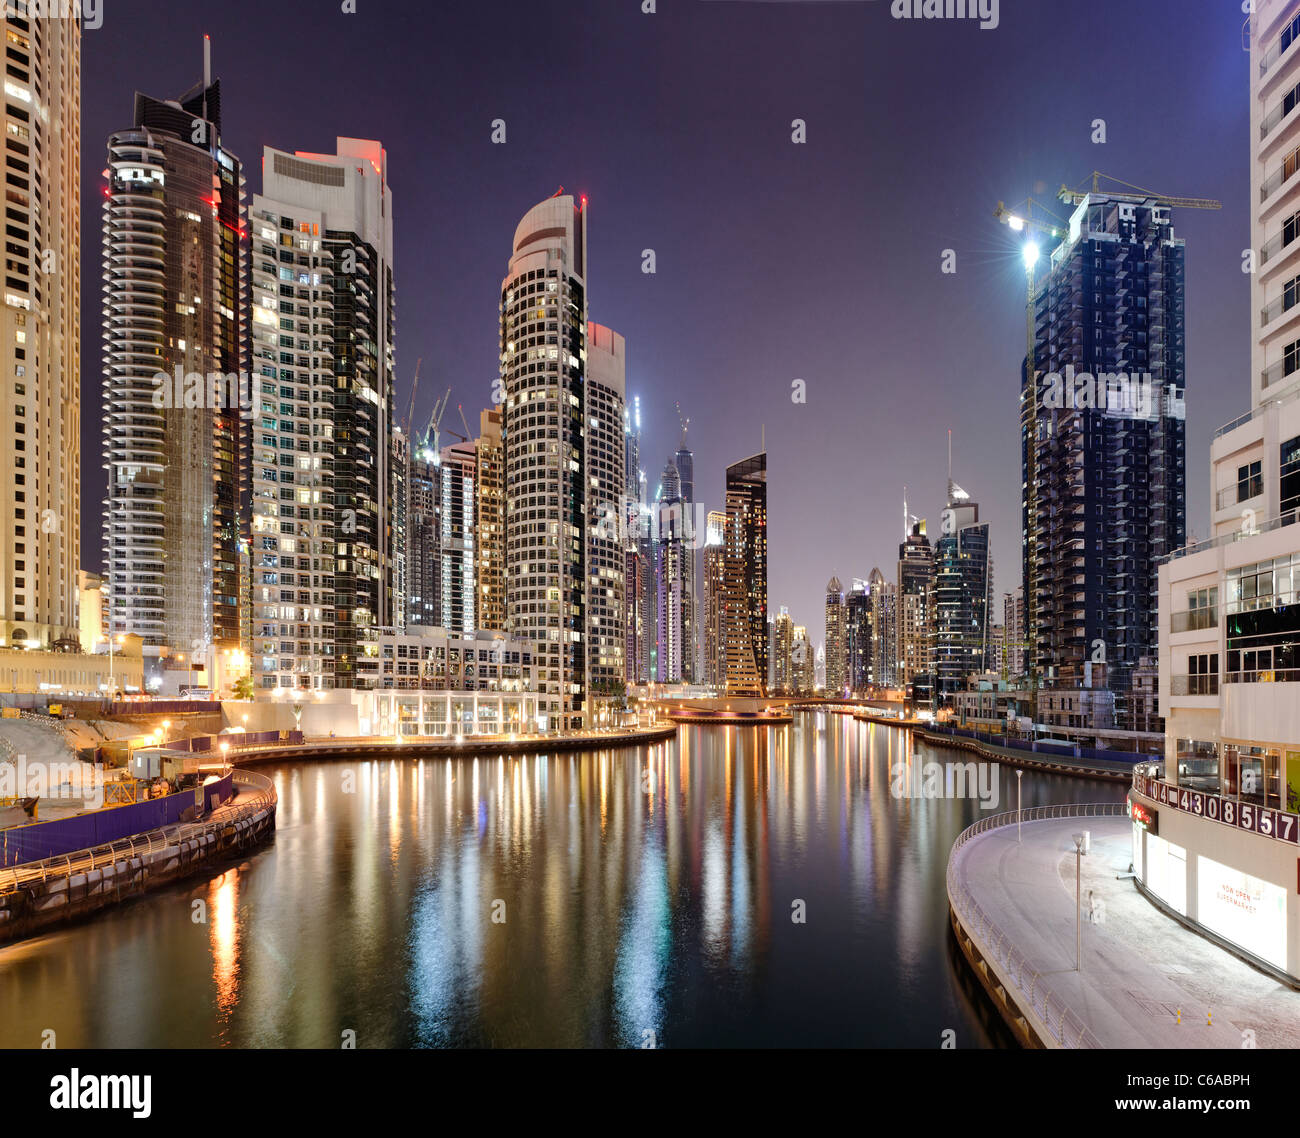 Spektakuläre Skyline bei Nacht, Dubai Marina, Dubai, Vereinigte Arabische Emirate, Naher Osten Stockbild